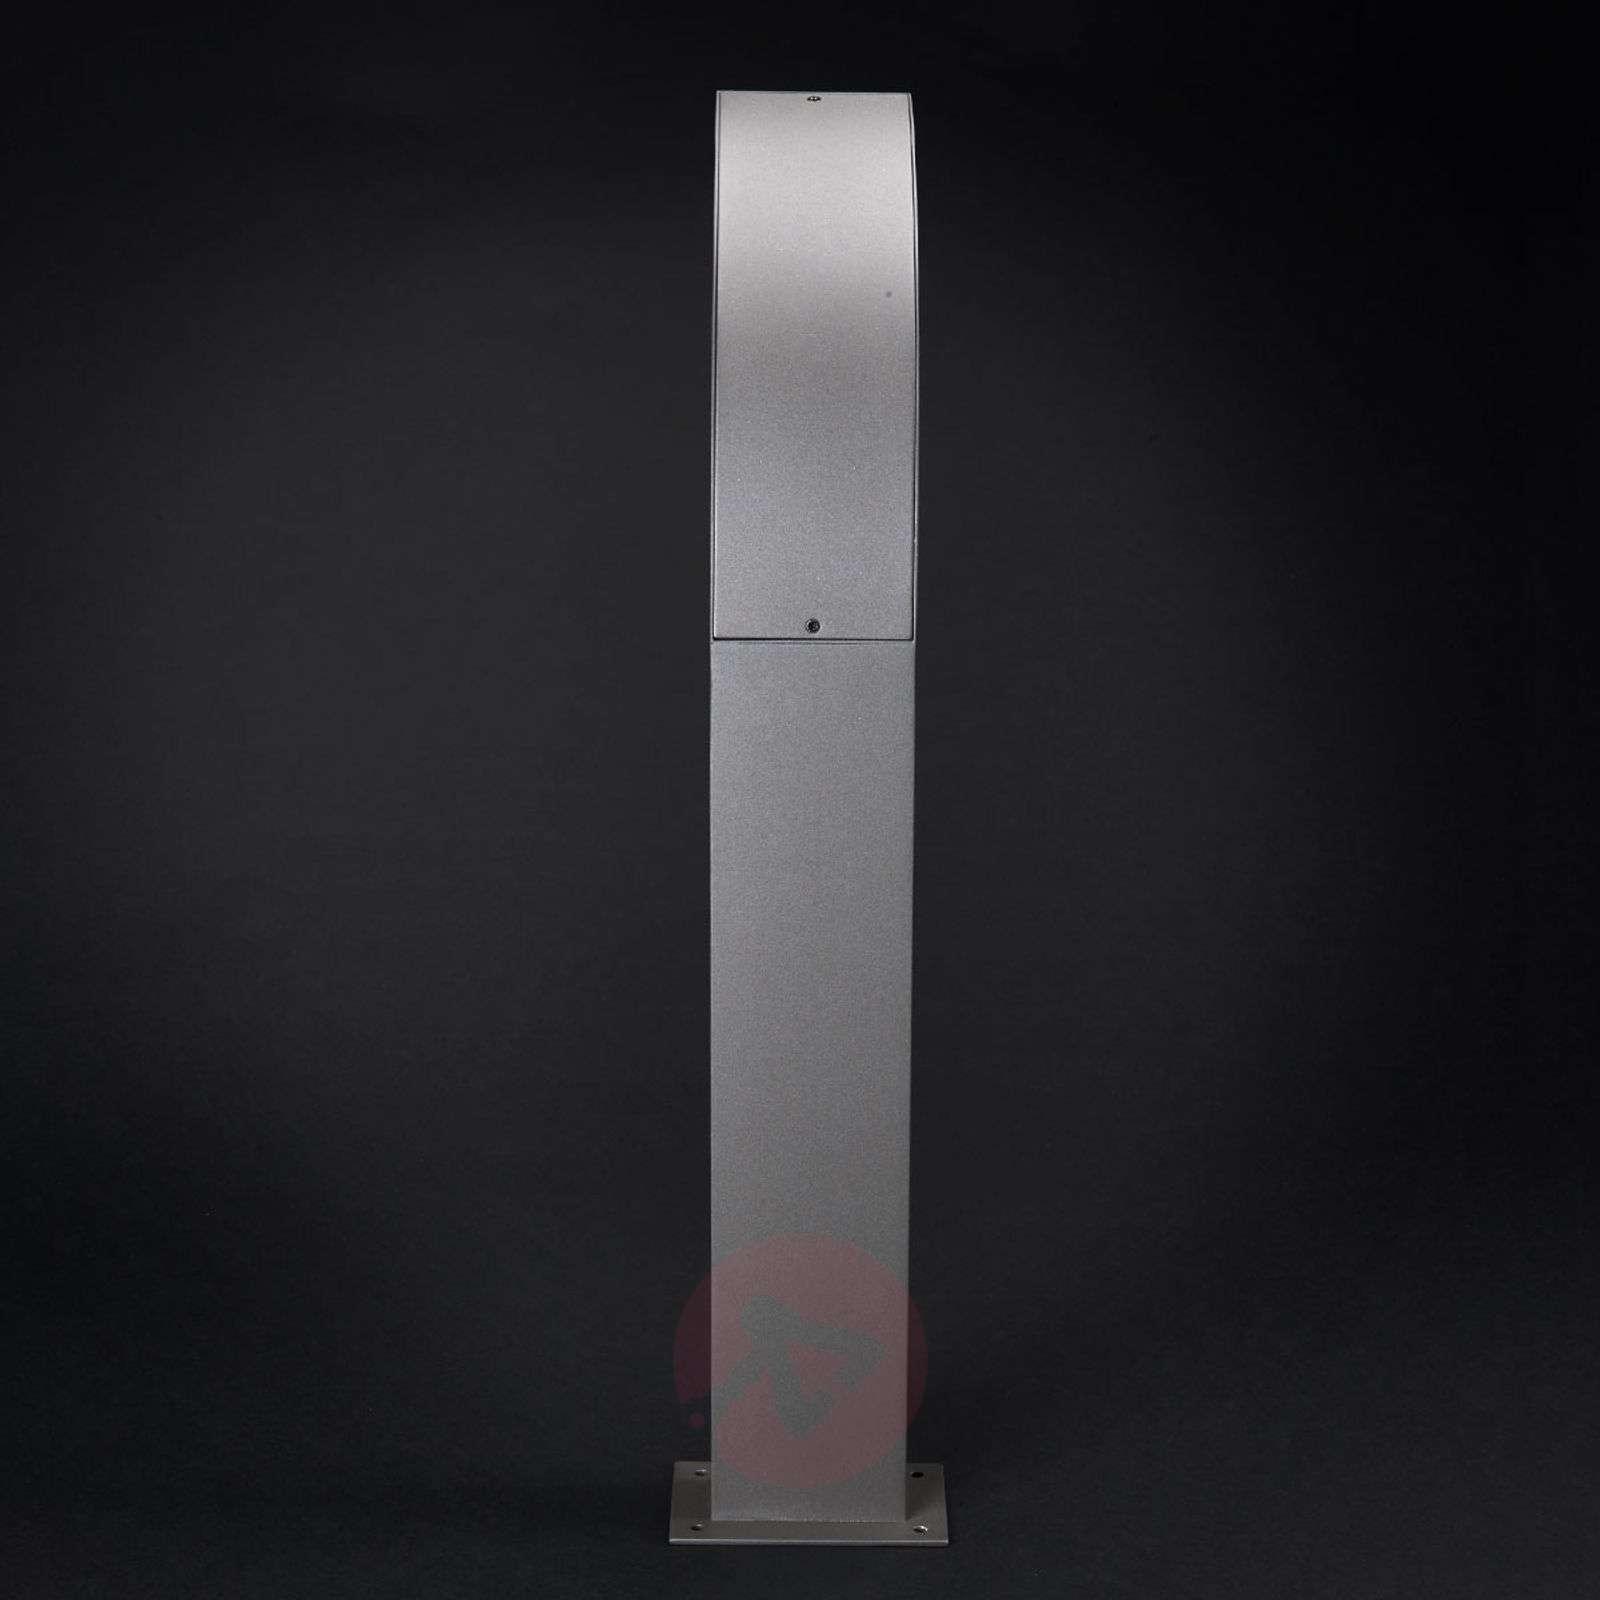 60 cm korkea LED-pollarivalaisin Lennik-9619005-04